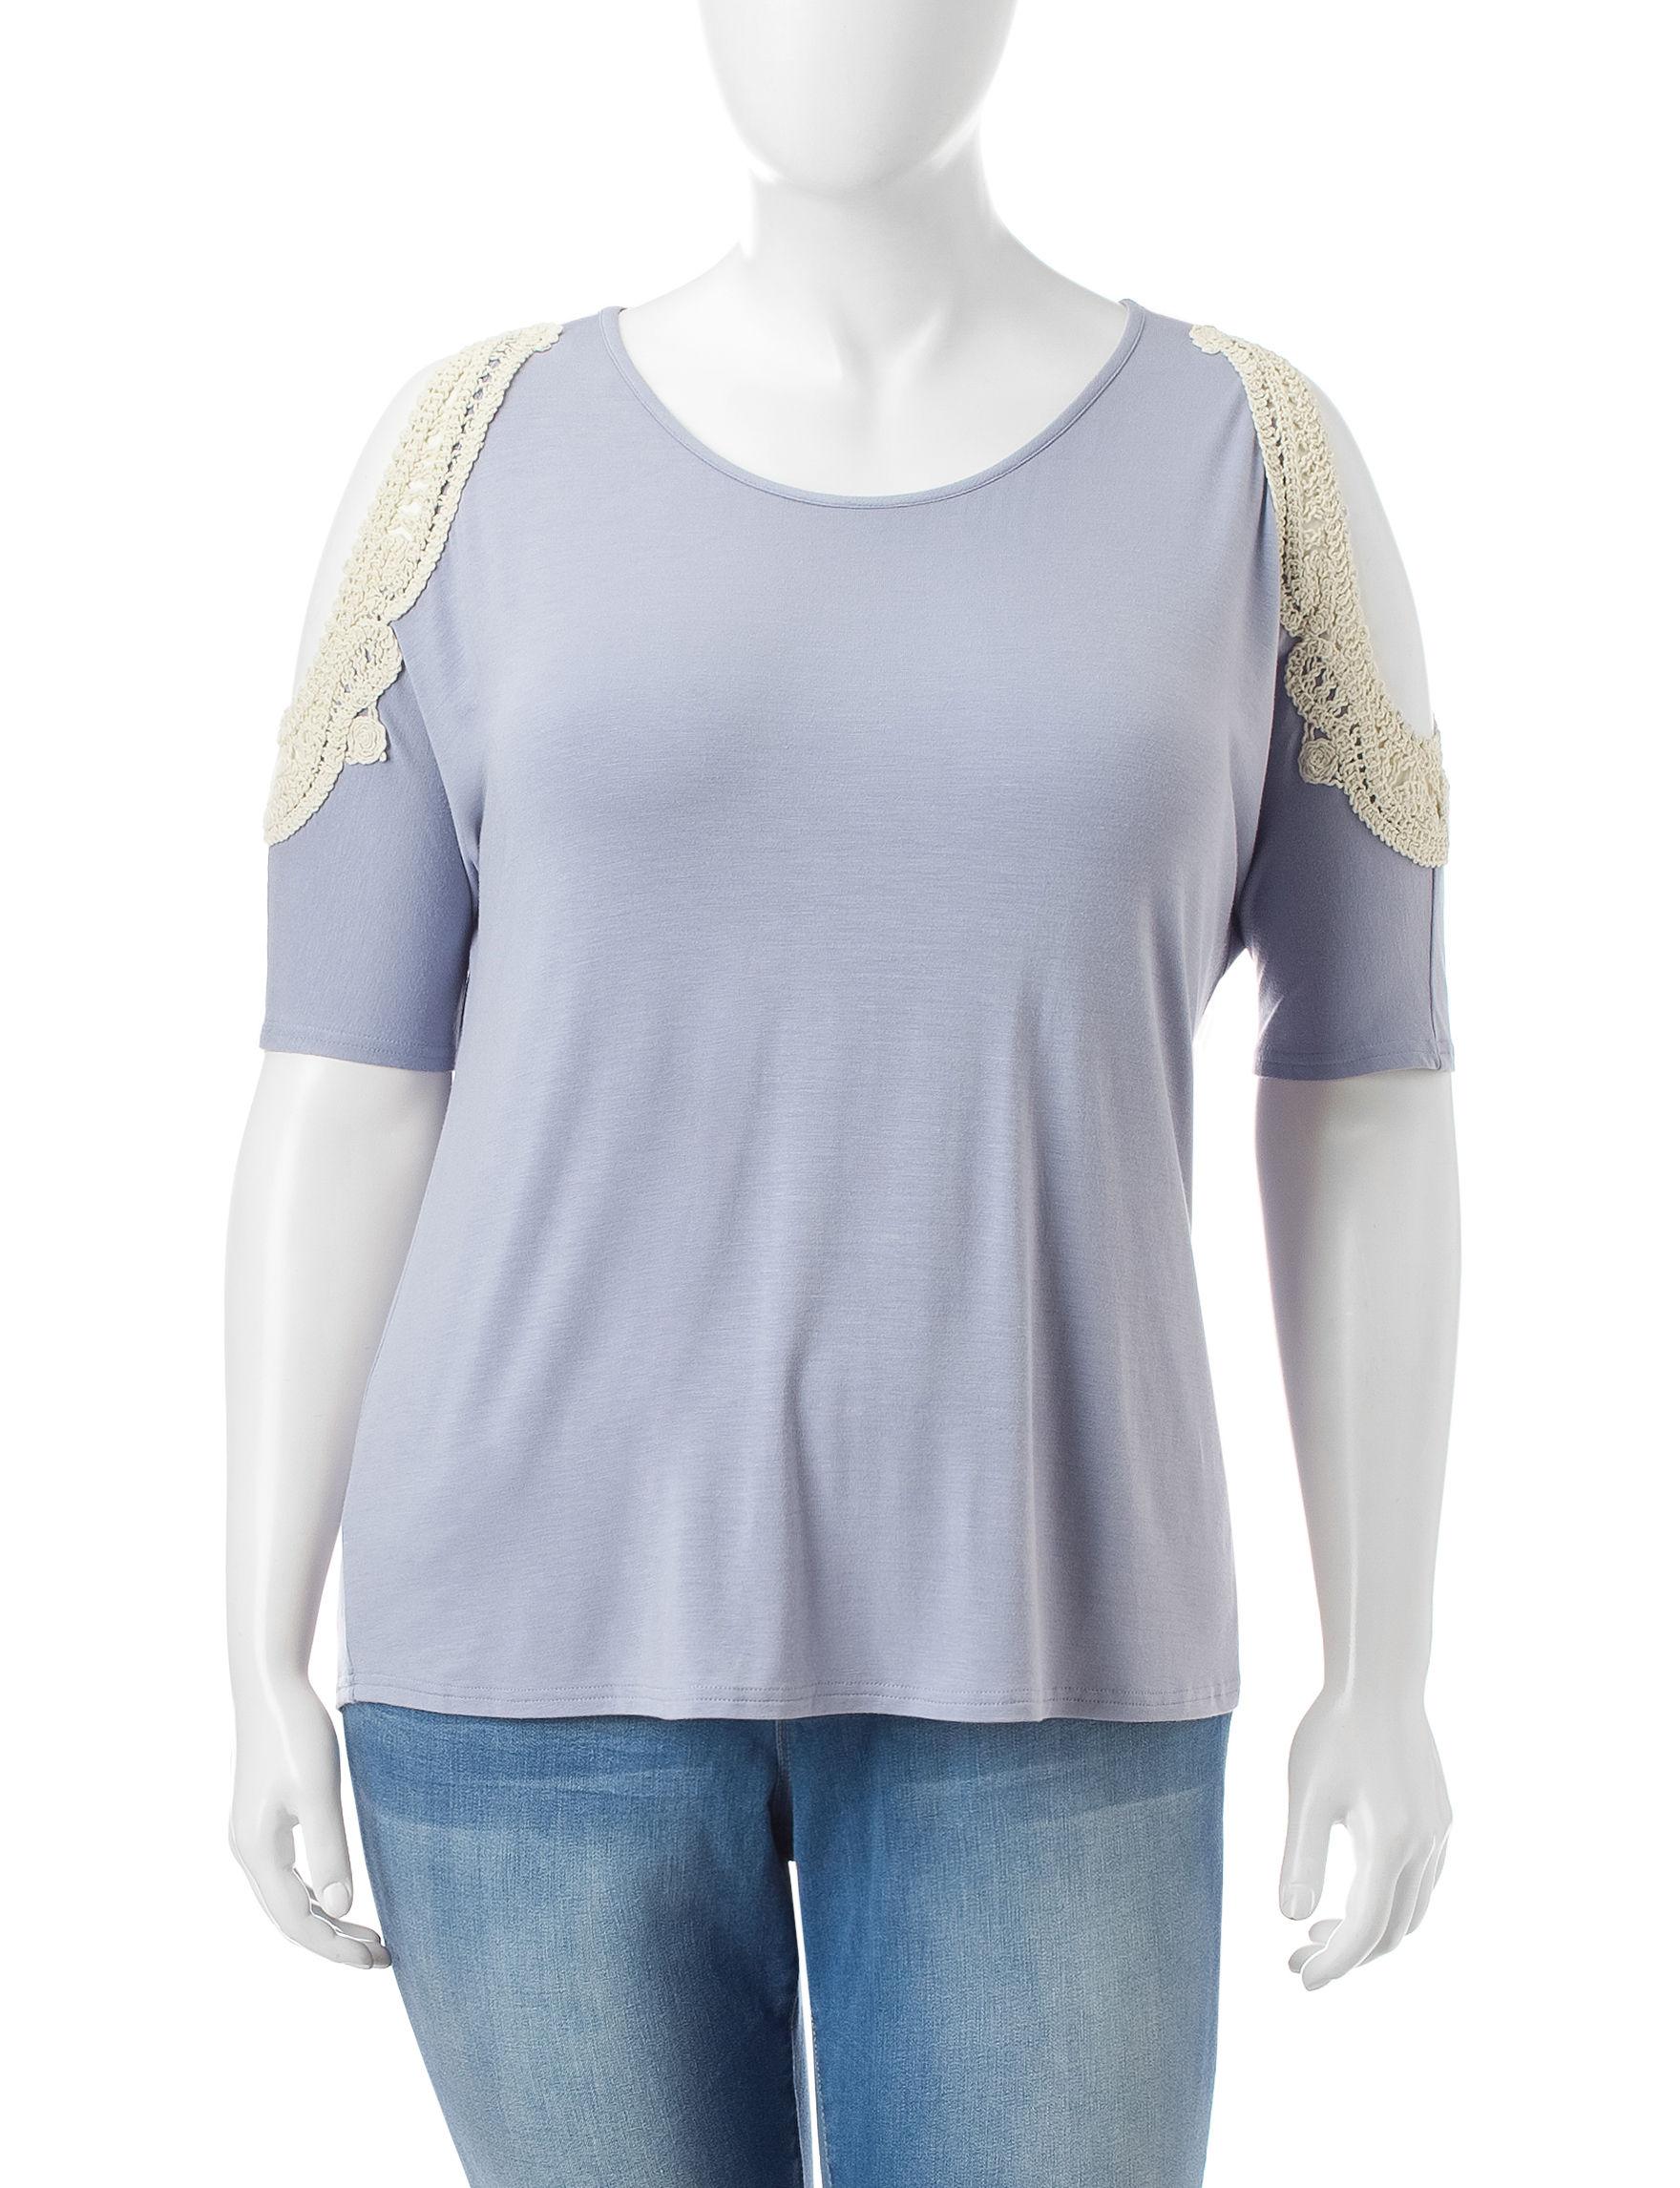 Justify Light Purple Shirts & Blouses